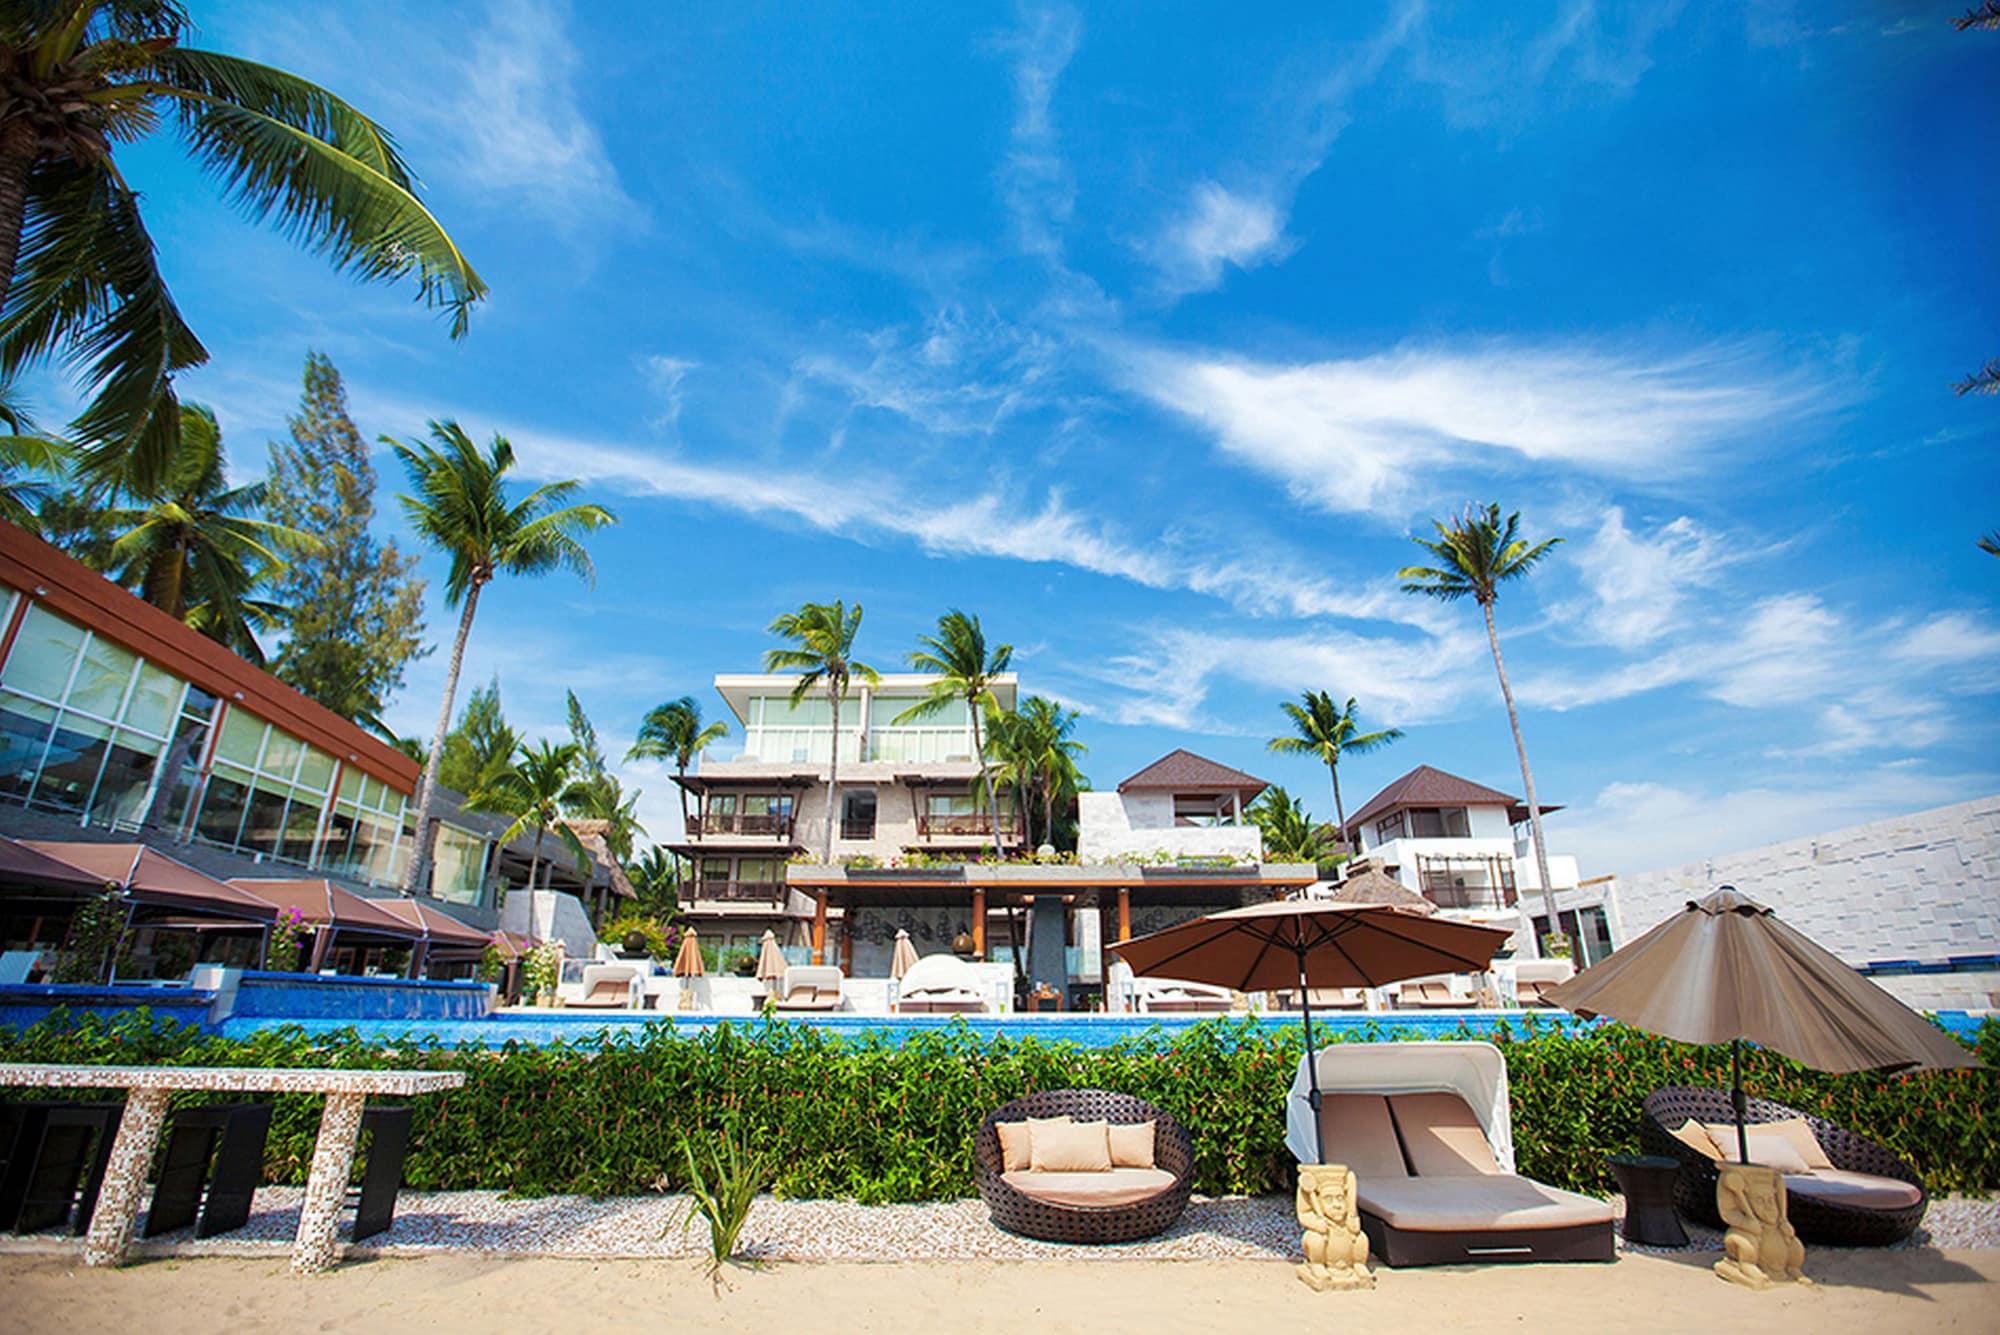 Dhevan Dara Beach Villa, Muang Prachuap Khiri Khan